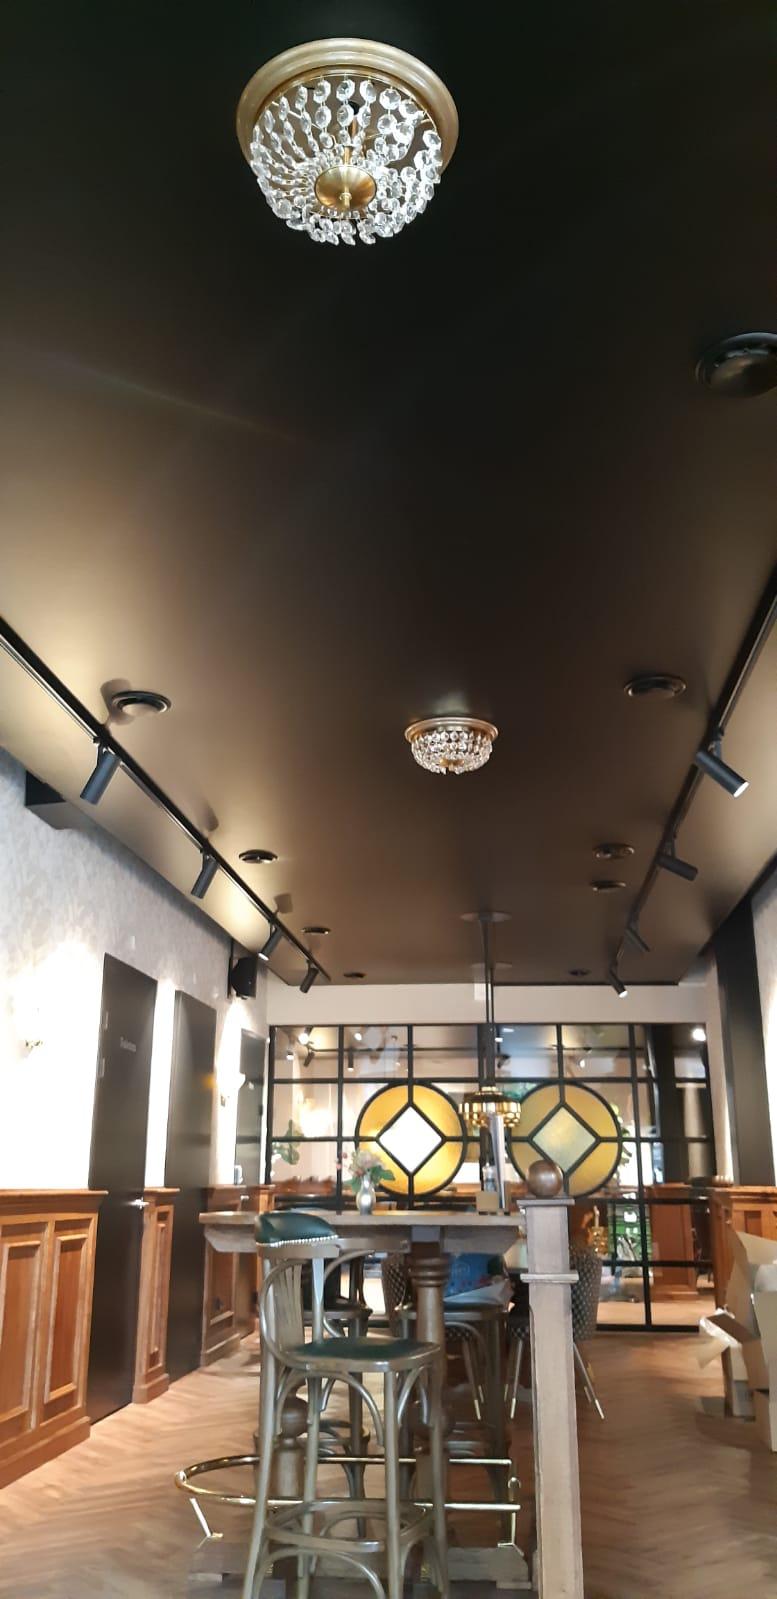 sierverlichting en ornamenten aan spanplafond monteren